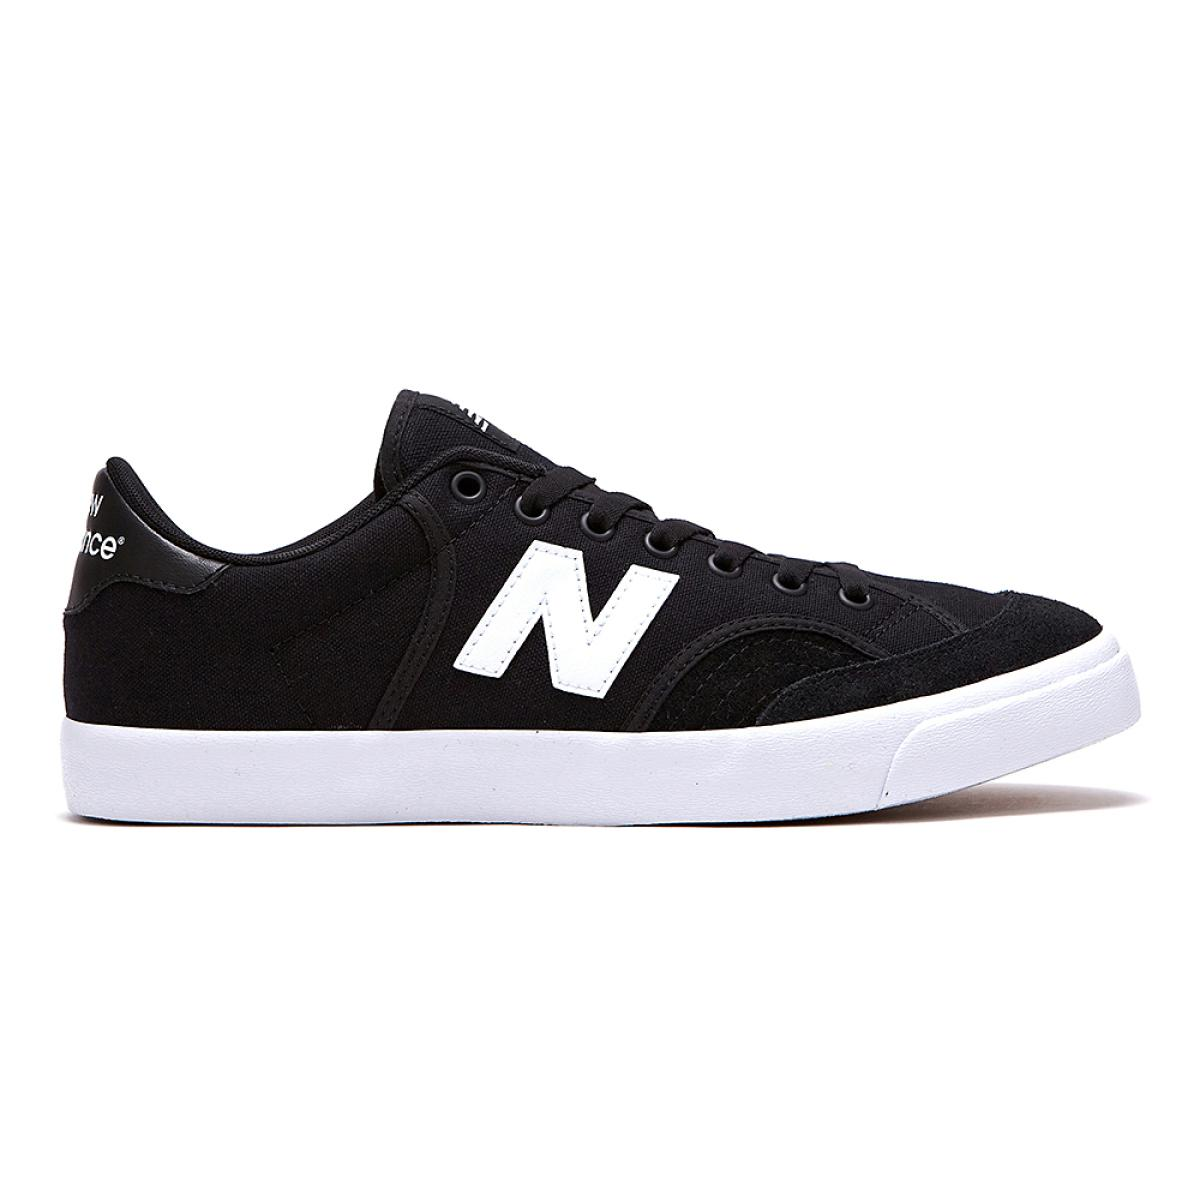 NM212OGB